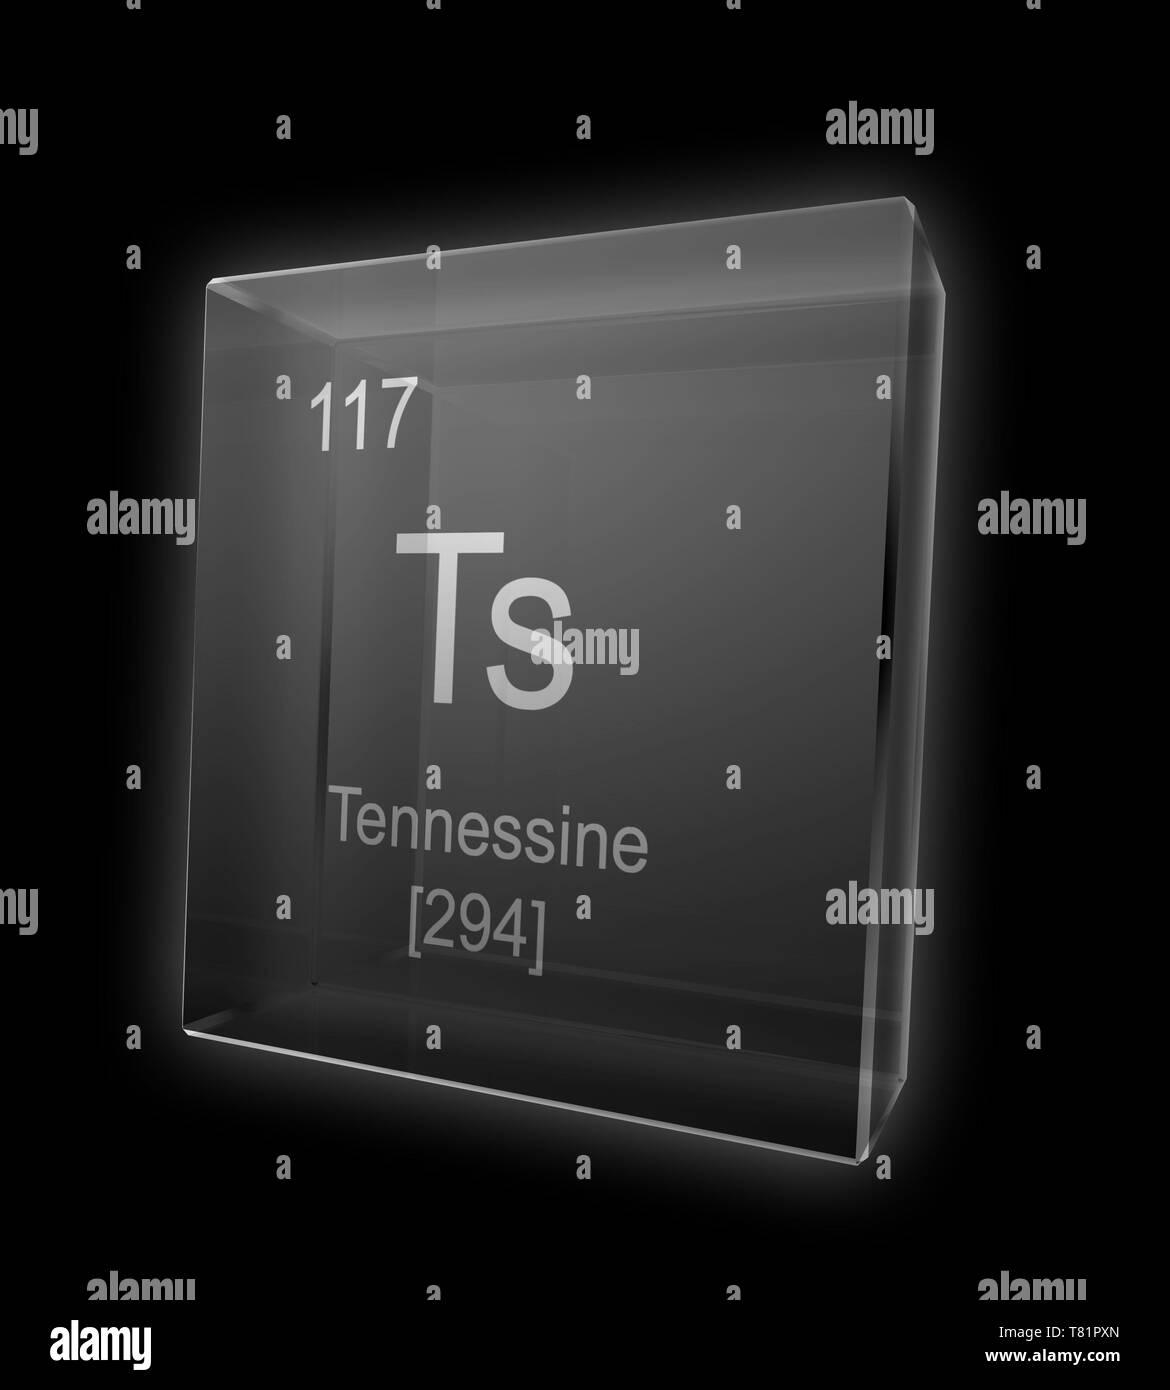 Tennessine, Chemical Element Symbol, Illustration - Stock Image